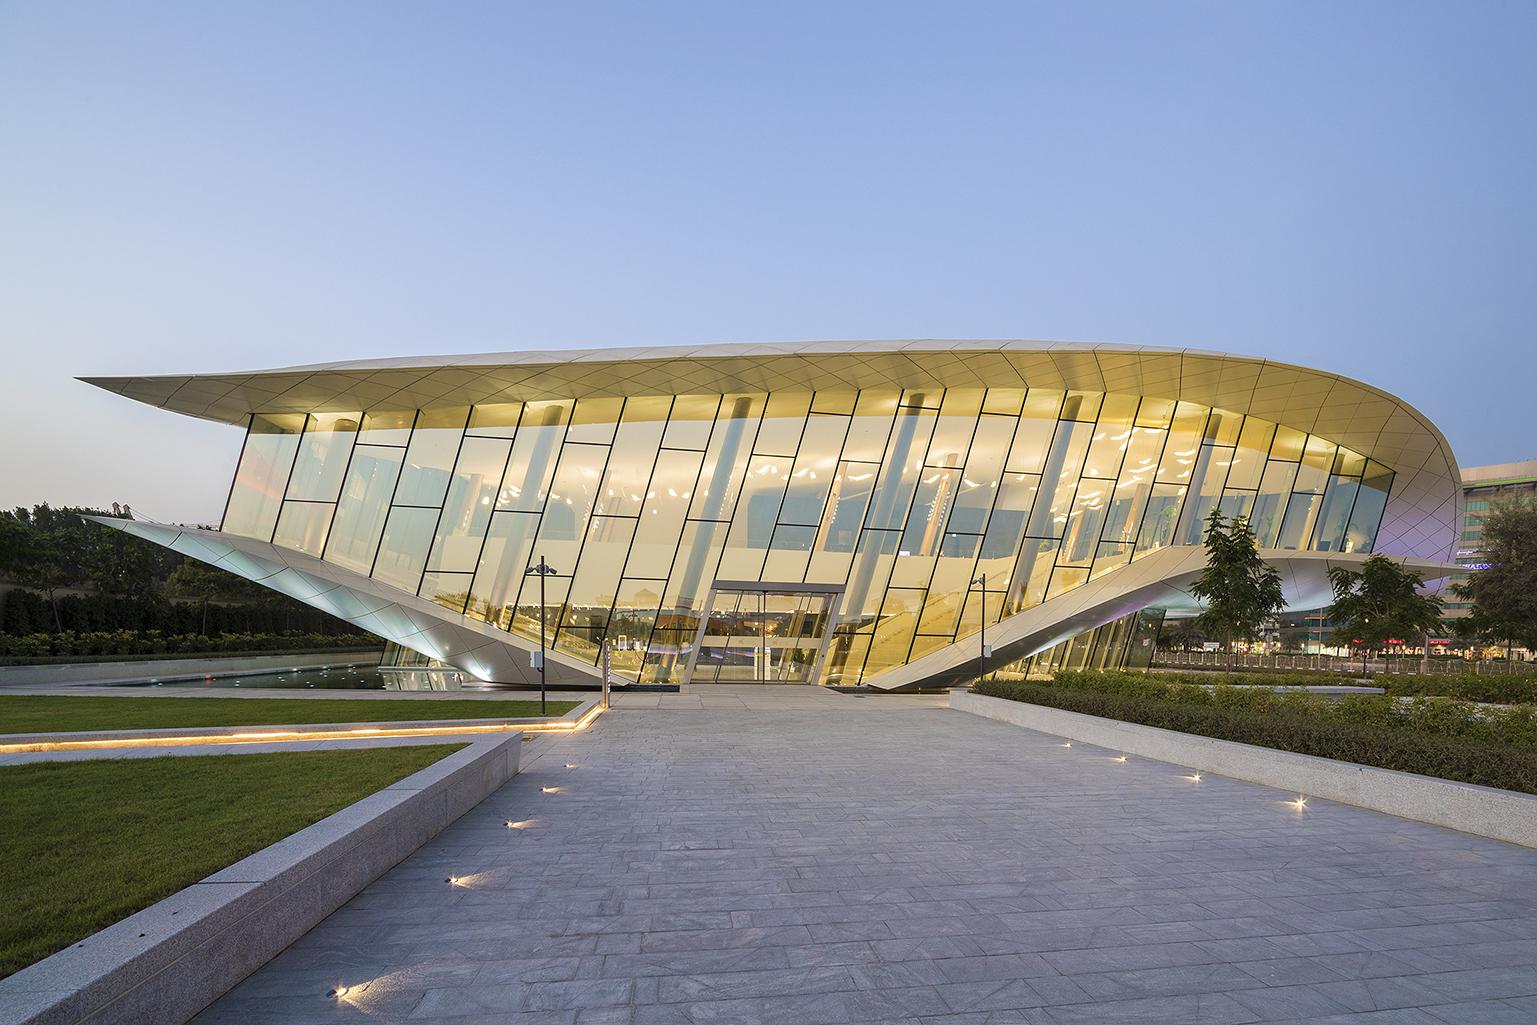 http://mtarch.com/projects/union-museum-dubai-uae/